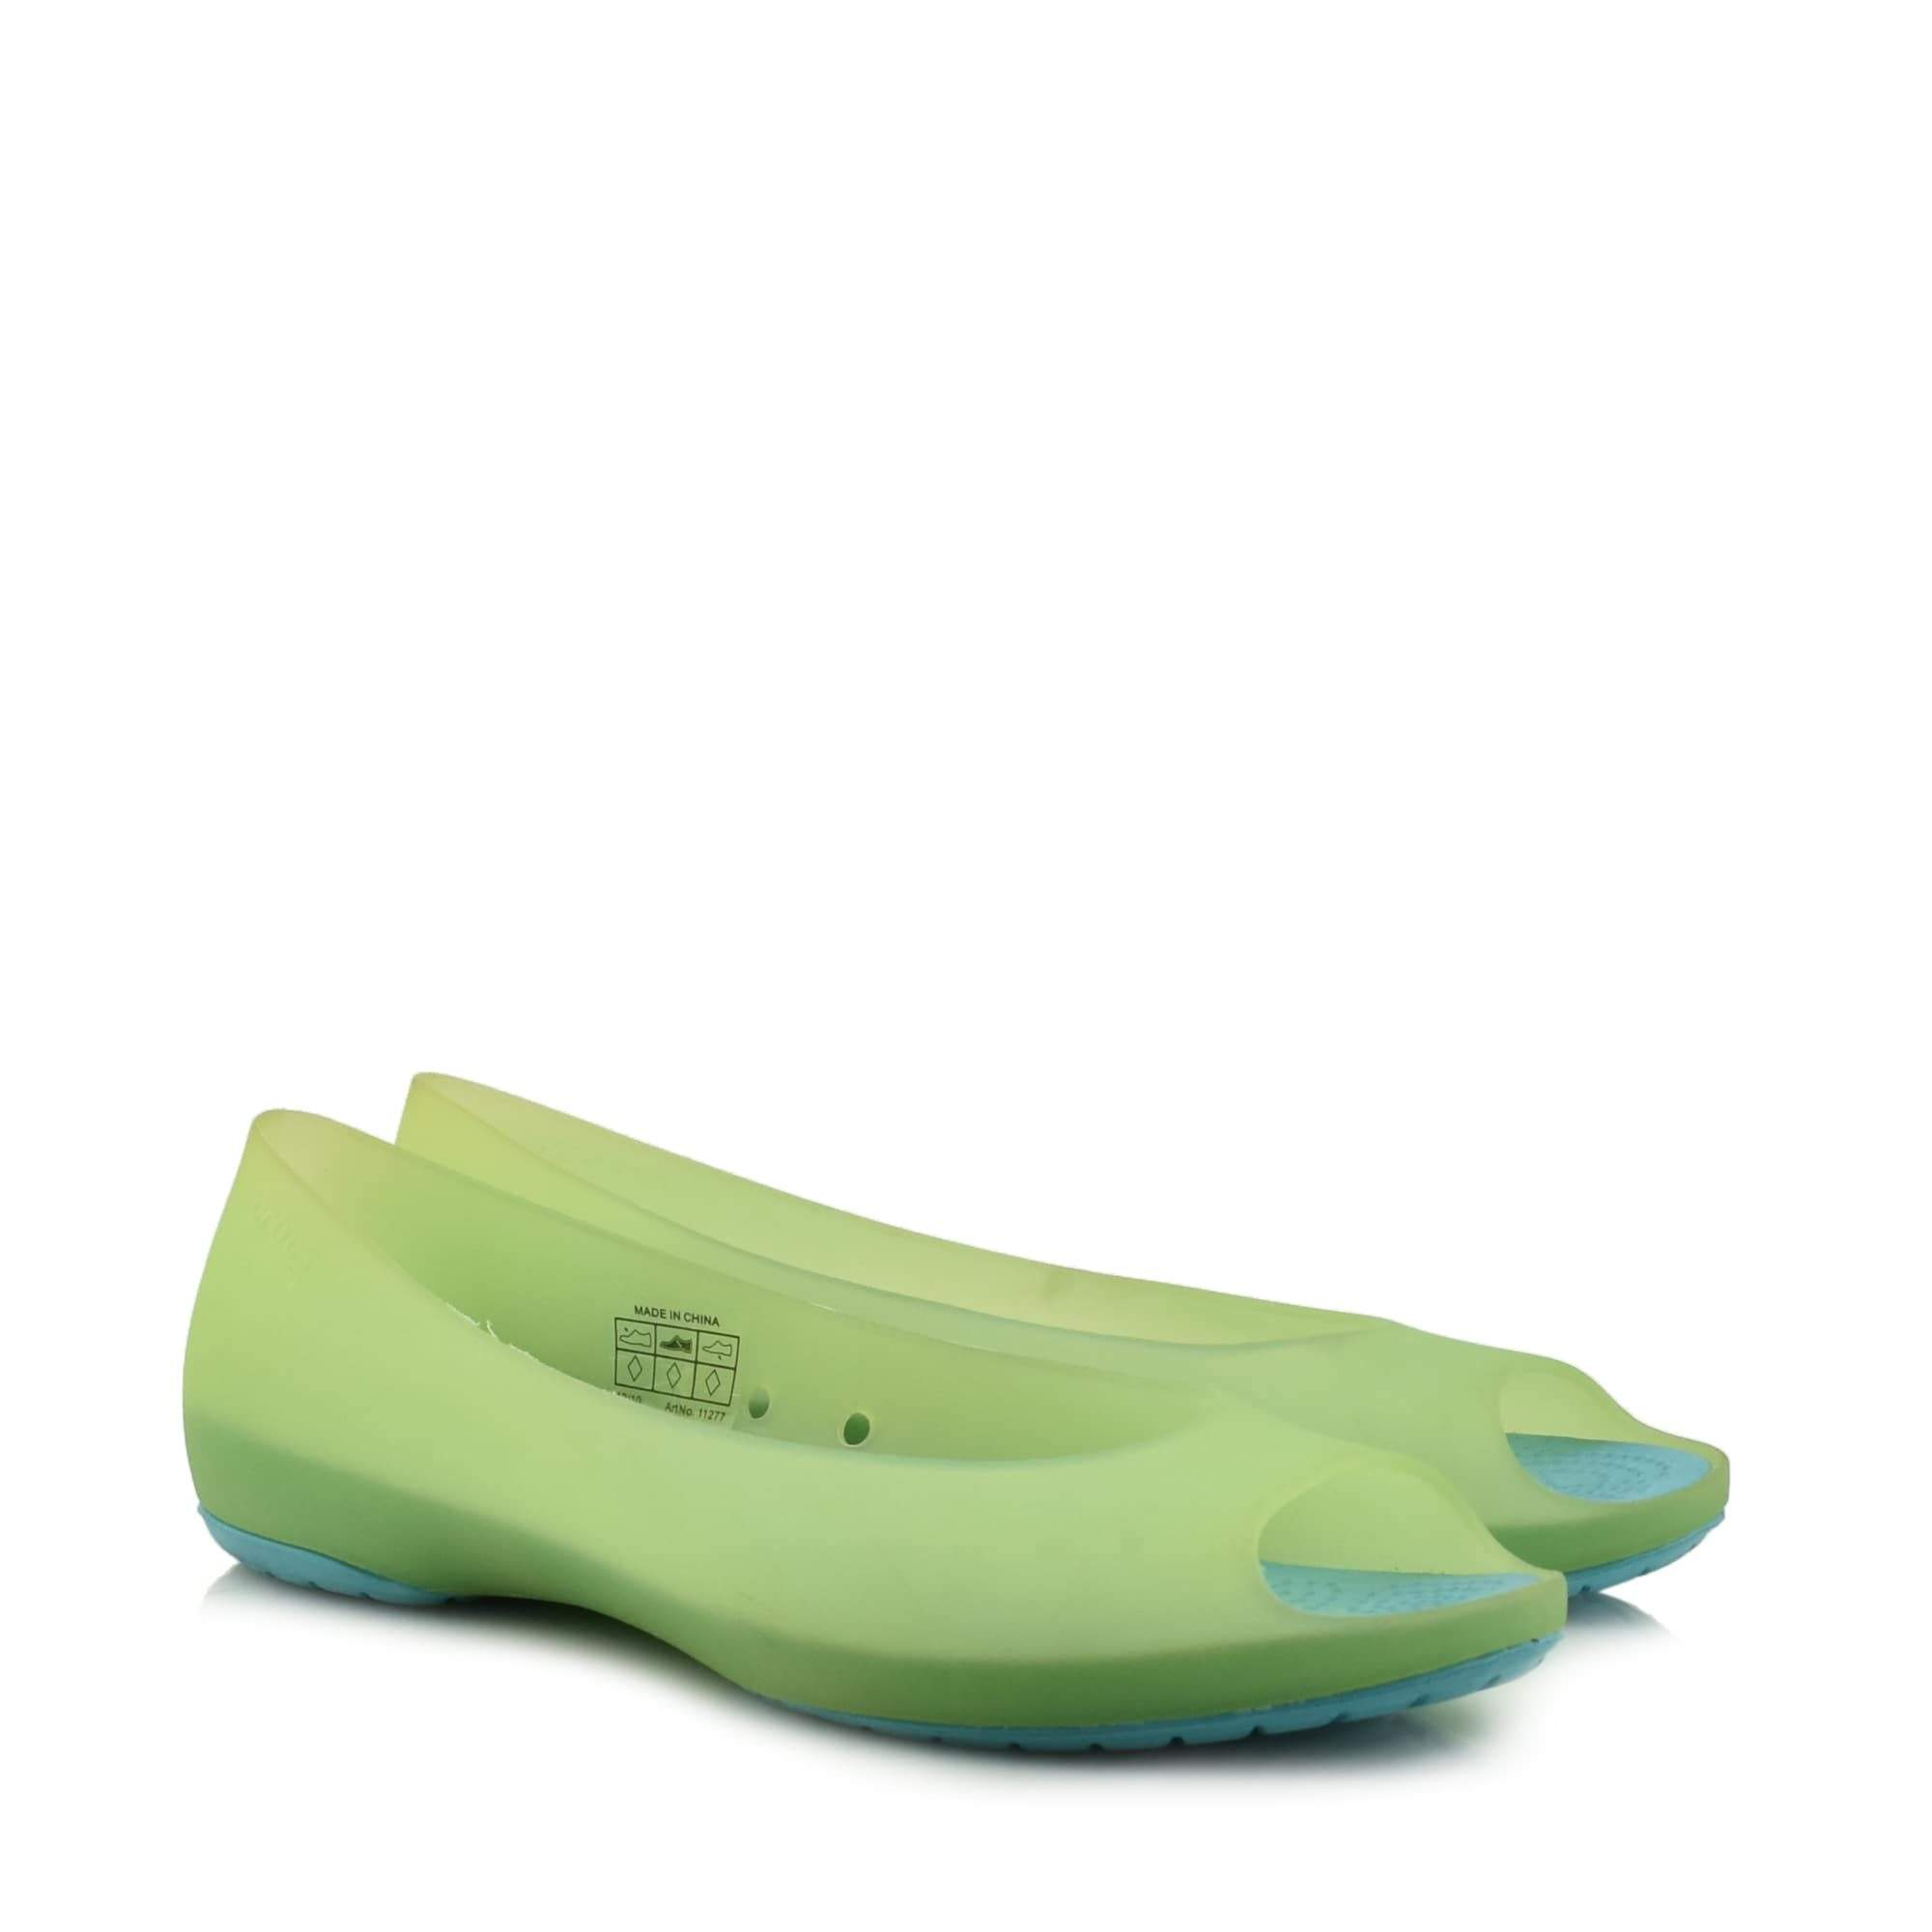 076071461c43 Προσφορές Dion Shop - Προσφορές Γυναικεία Παπούτσια από τα ...